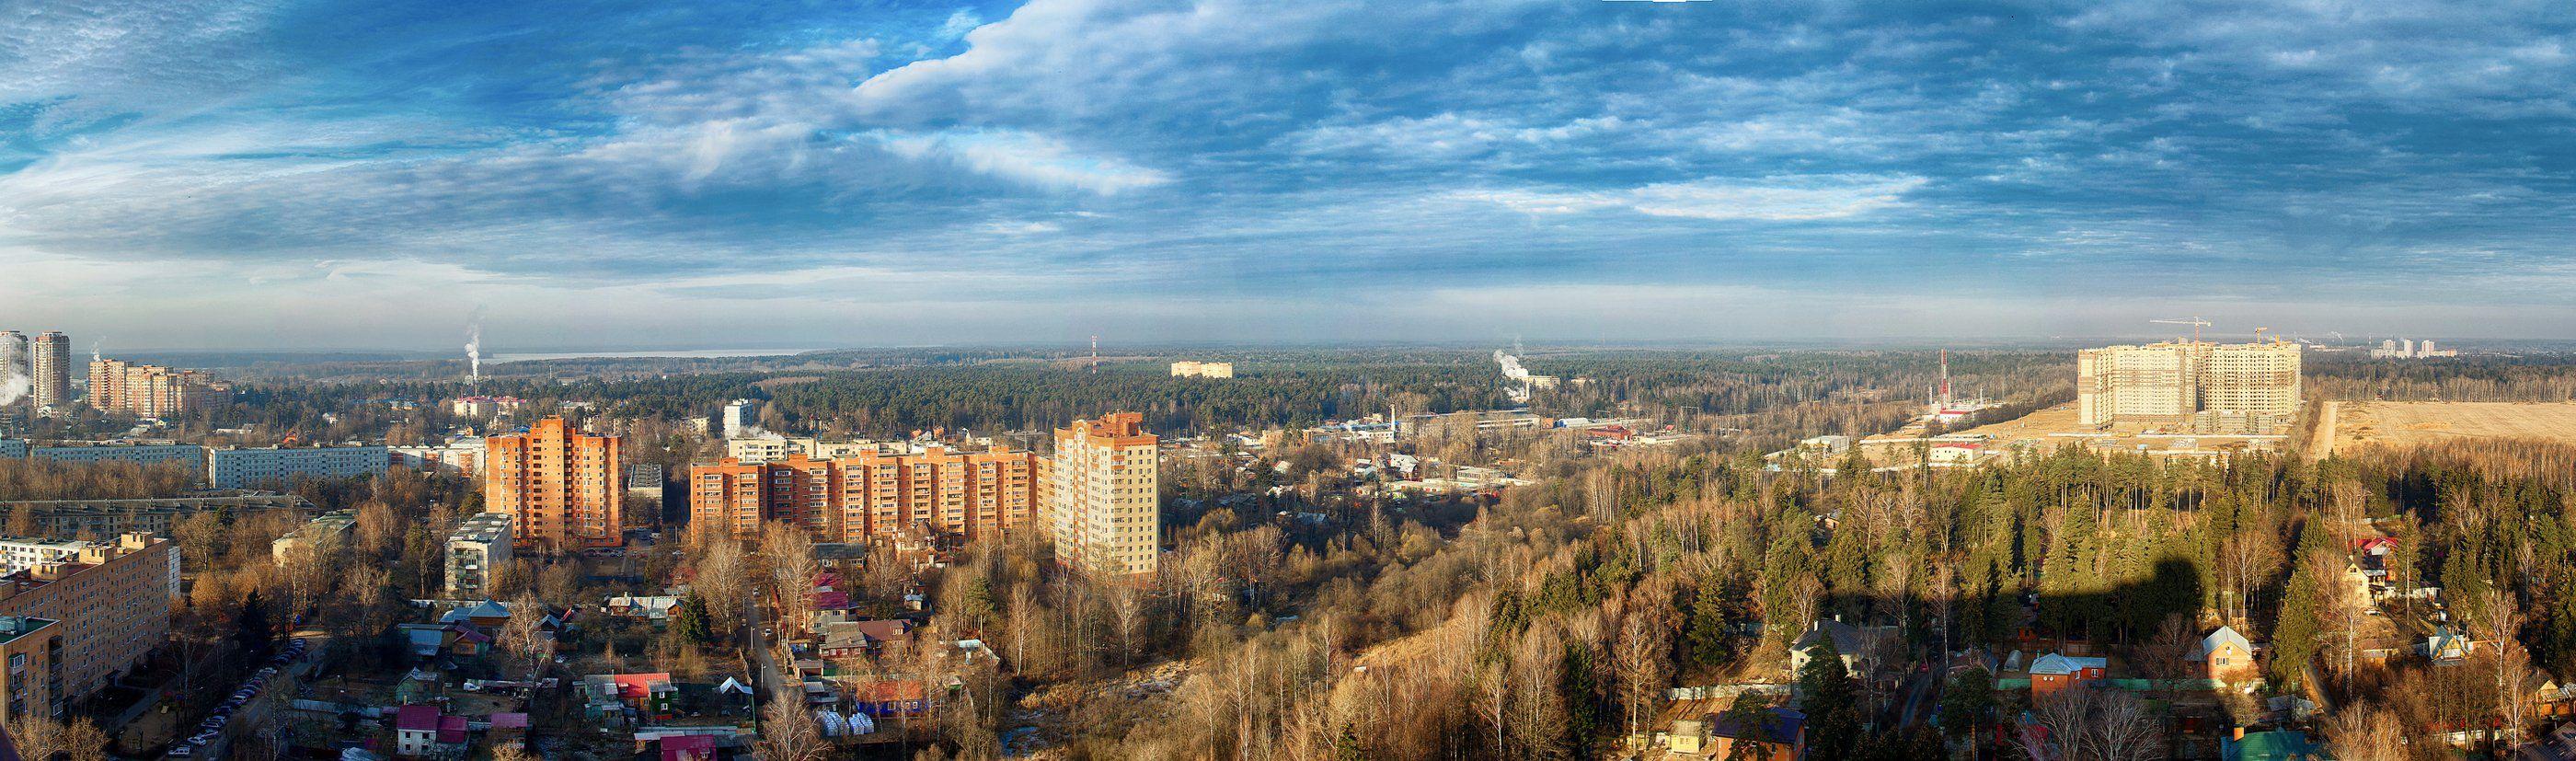 пейзаж, Плотников Андрей